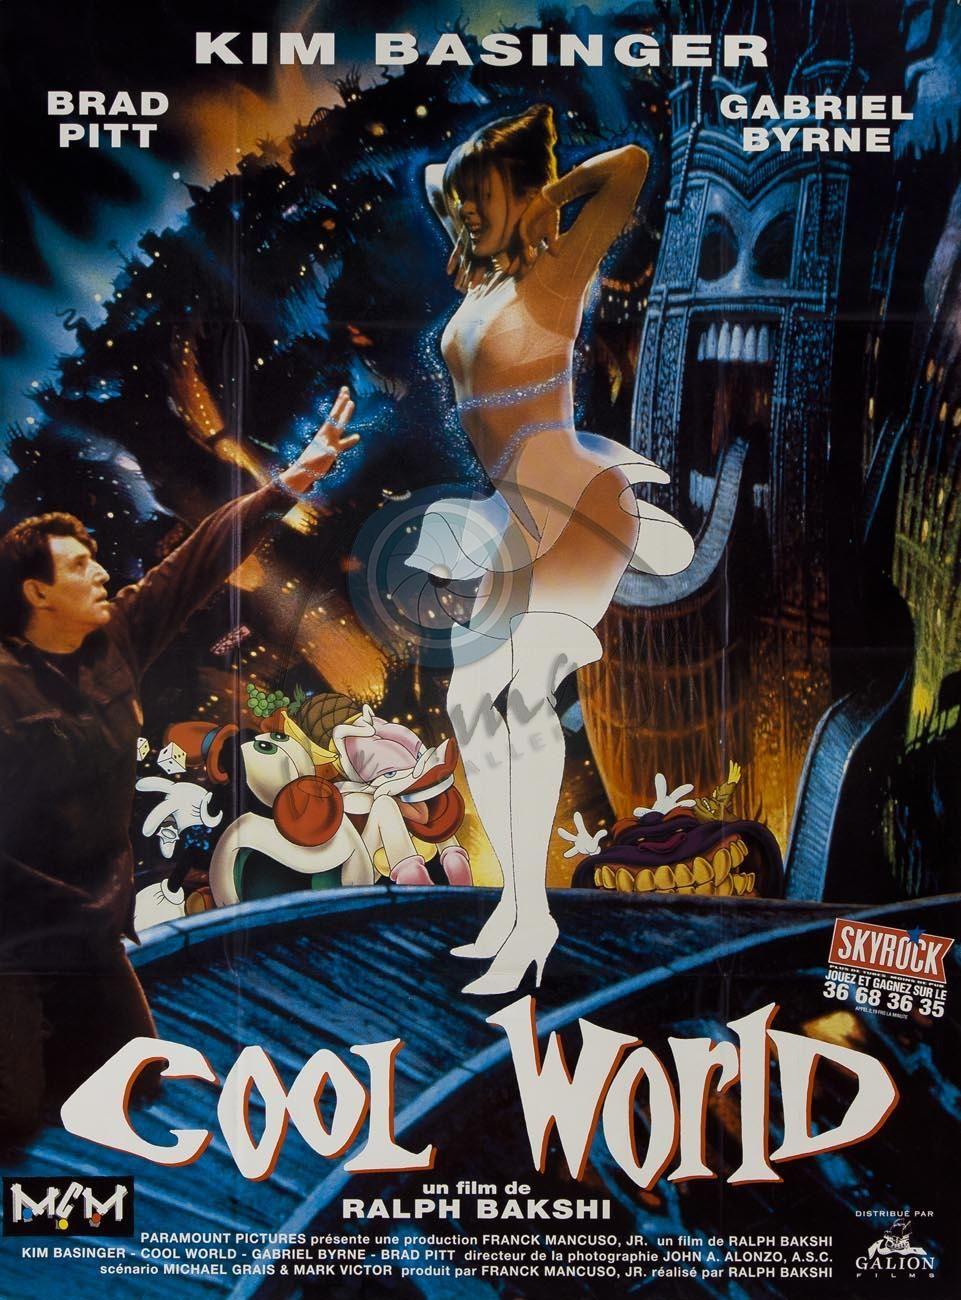 Cool World 1992 Ralph Bakshi Peliculas Completas Peliculas Completas Gratis Peliculas